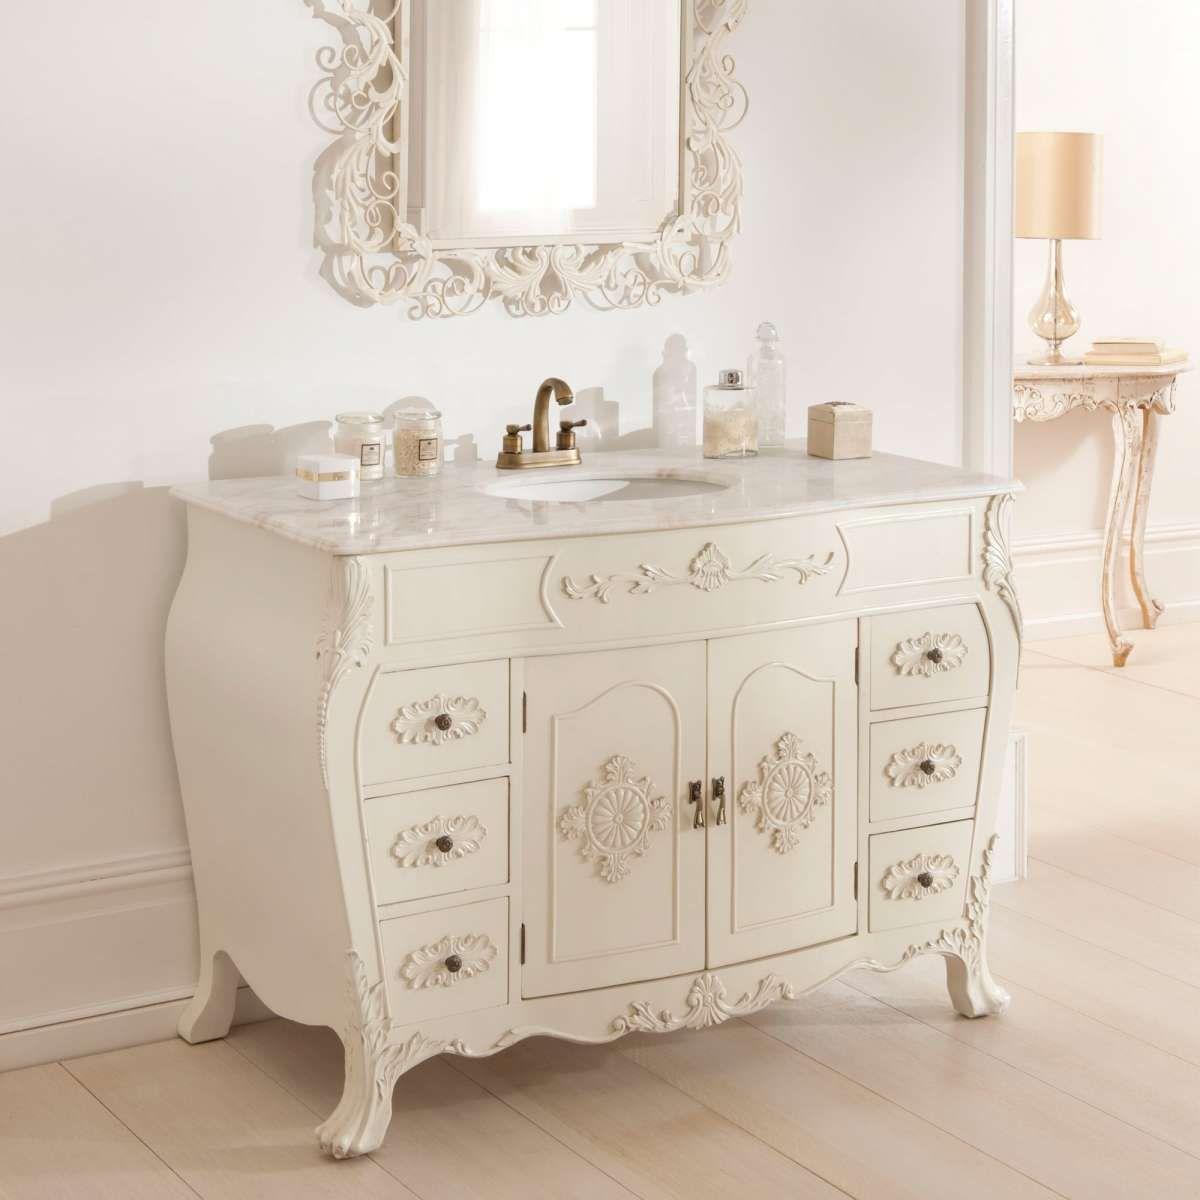 15 Top Shabby Chic Vanity Unit Photos Shabby Chic Bathroom Vanity Shabby Chic Vanity Unit Chic Bathrooms [ 1200 x 1200 Pixel ]